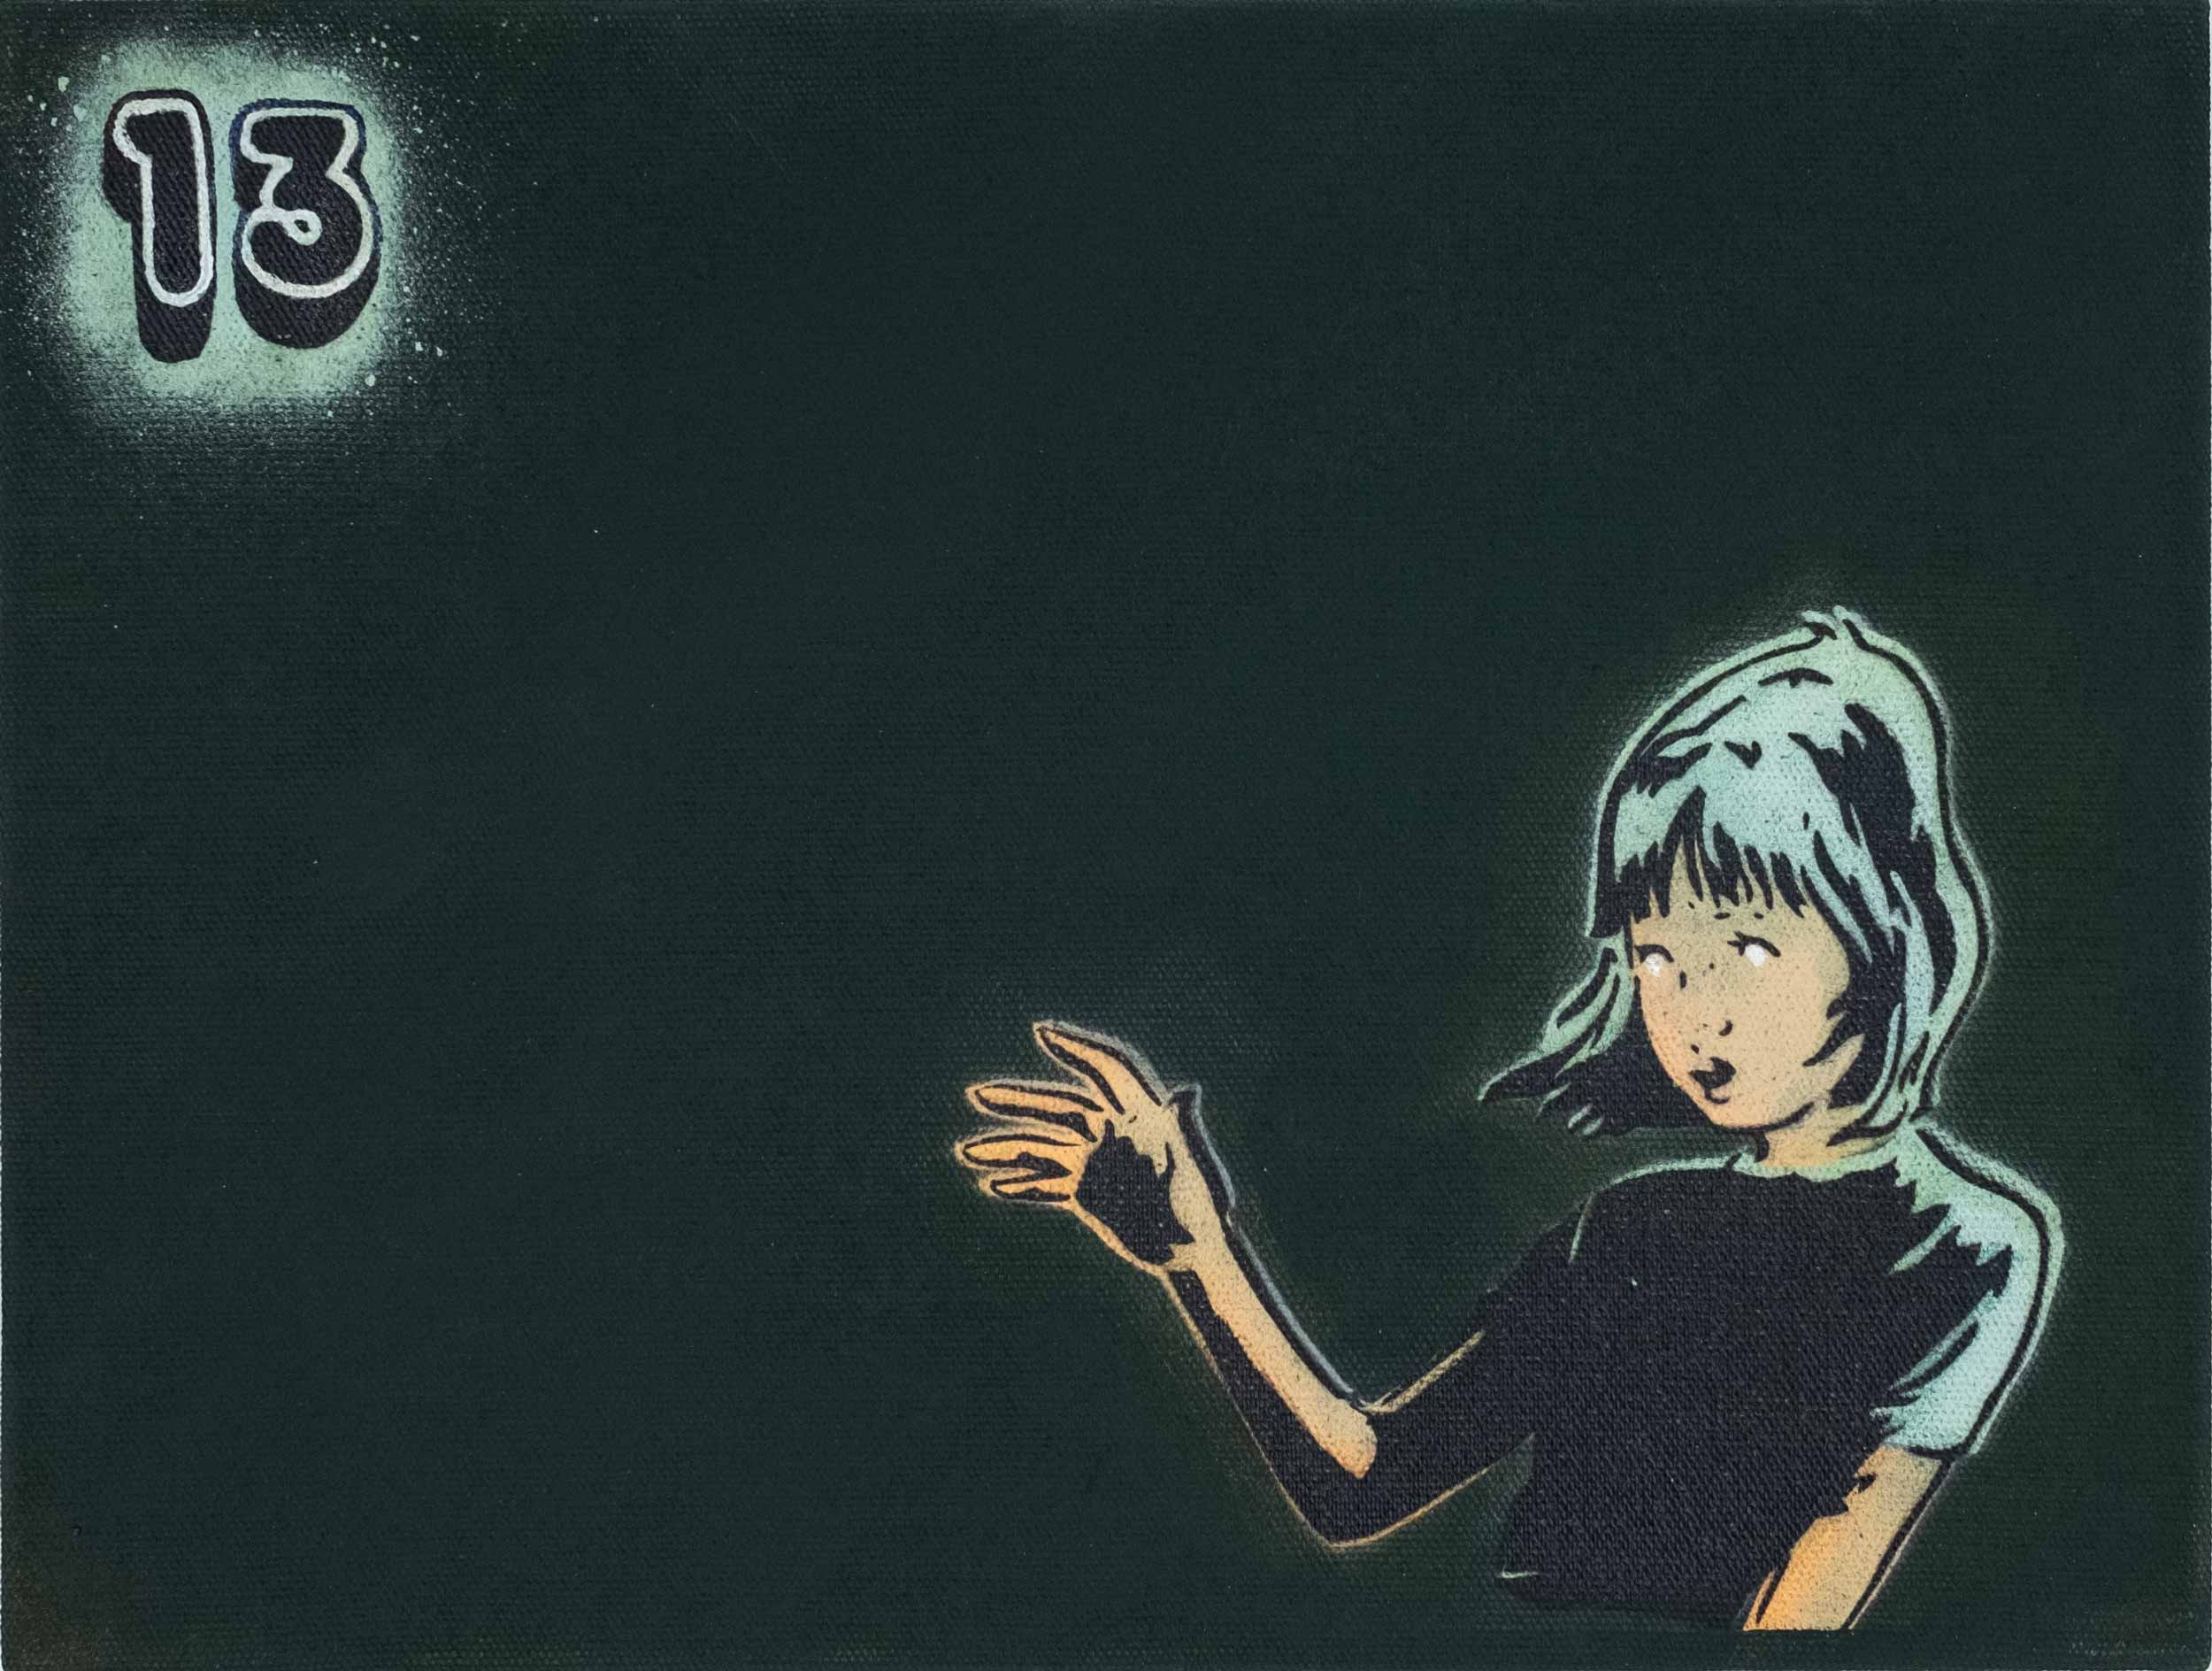 Mando Marie - Taken By The Glow 13